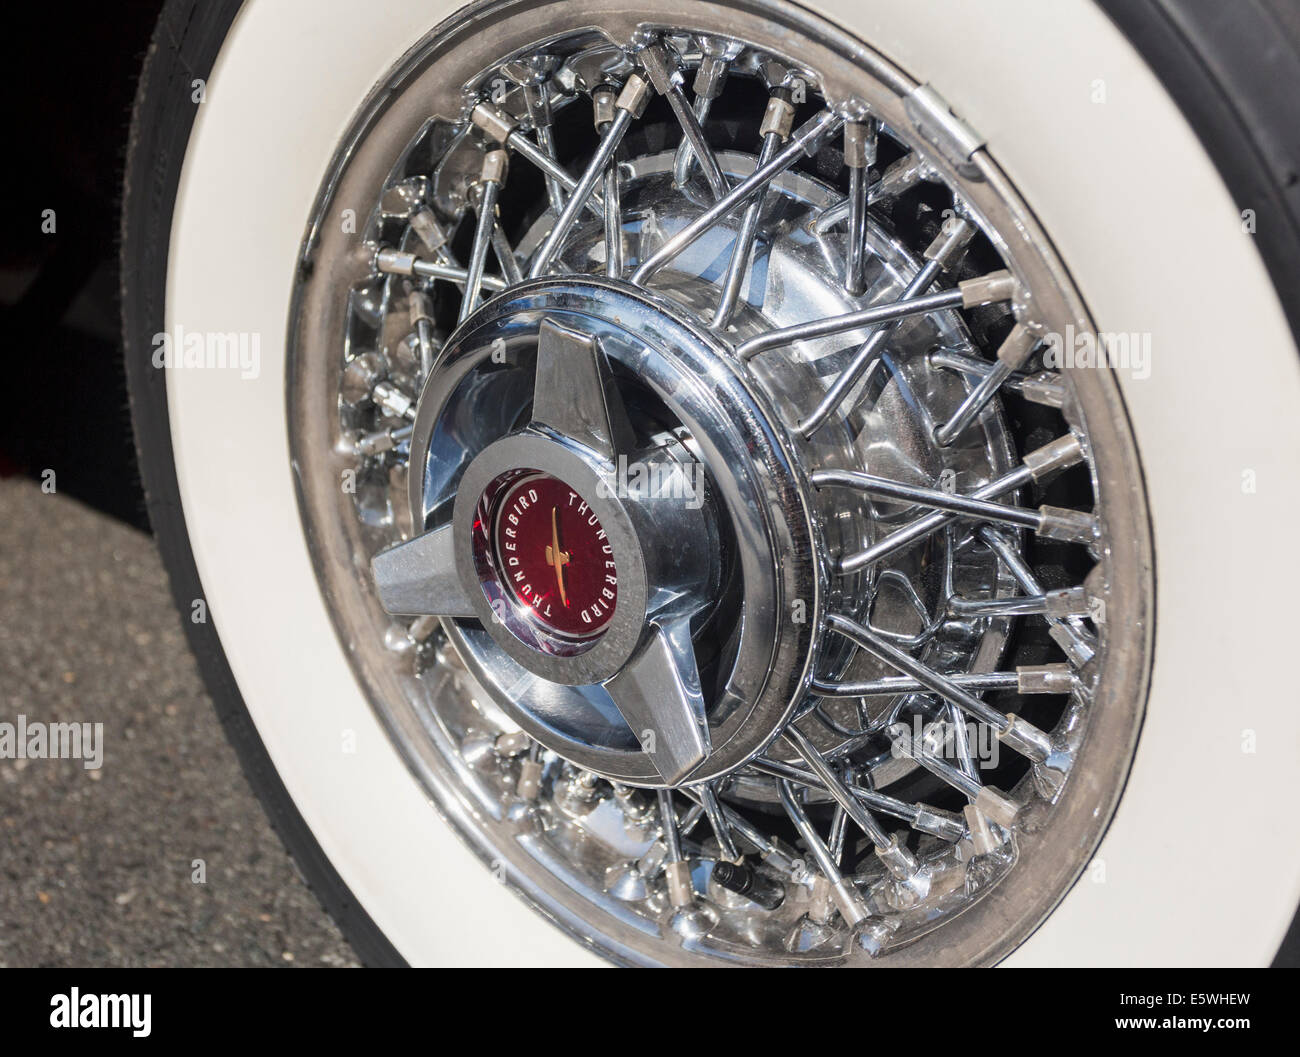 White-wall tire on Ford Thunderbird car, USA - Stock Image